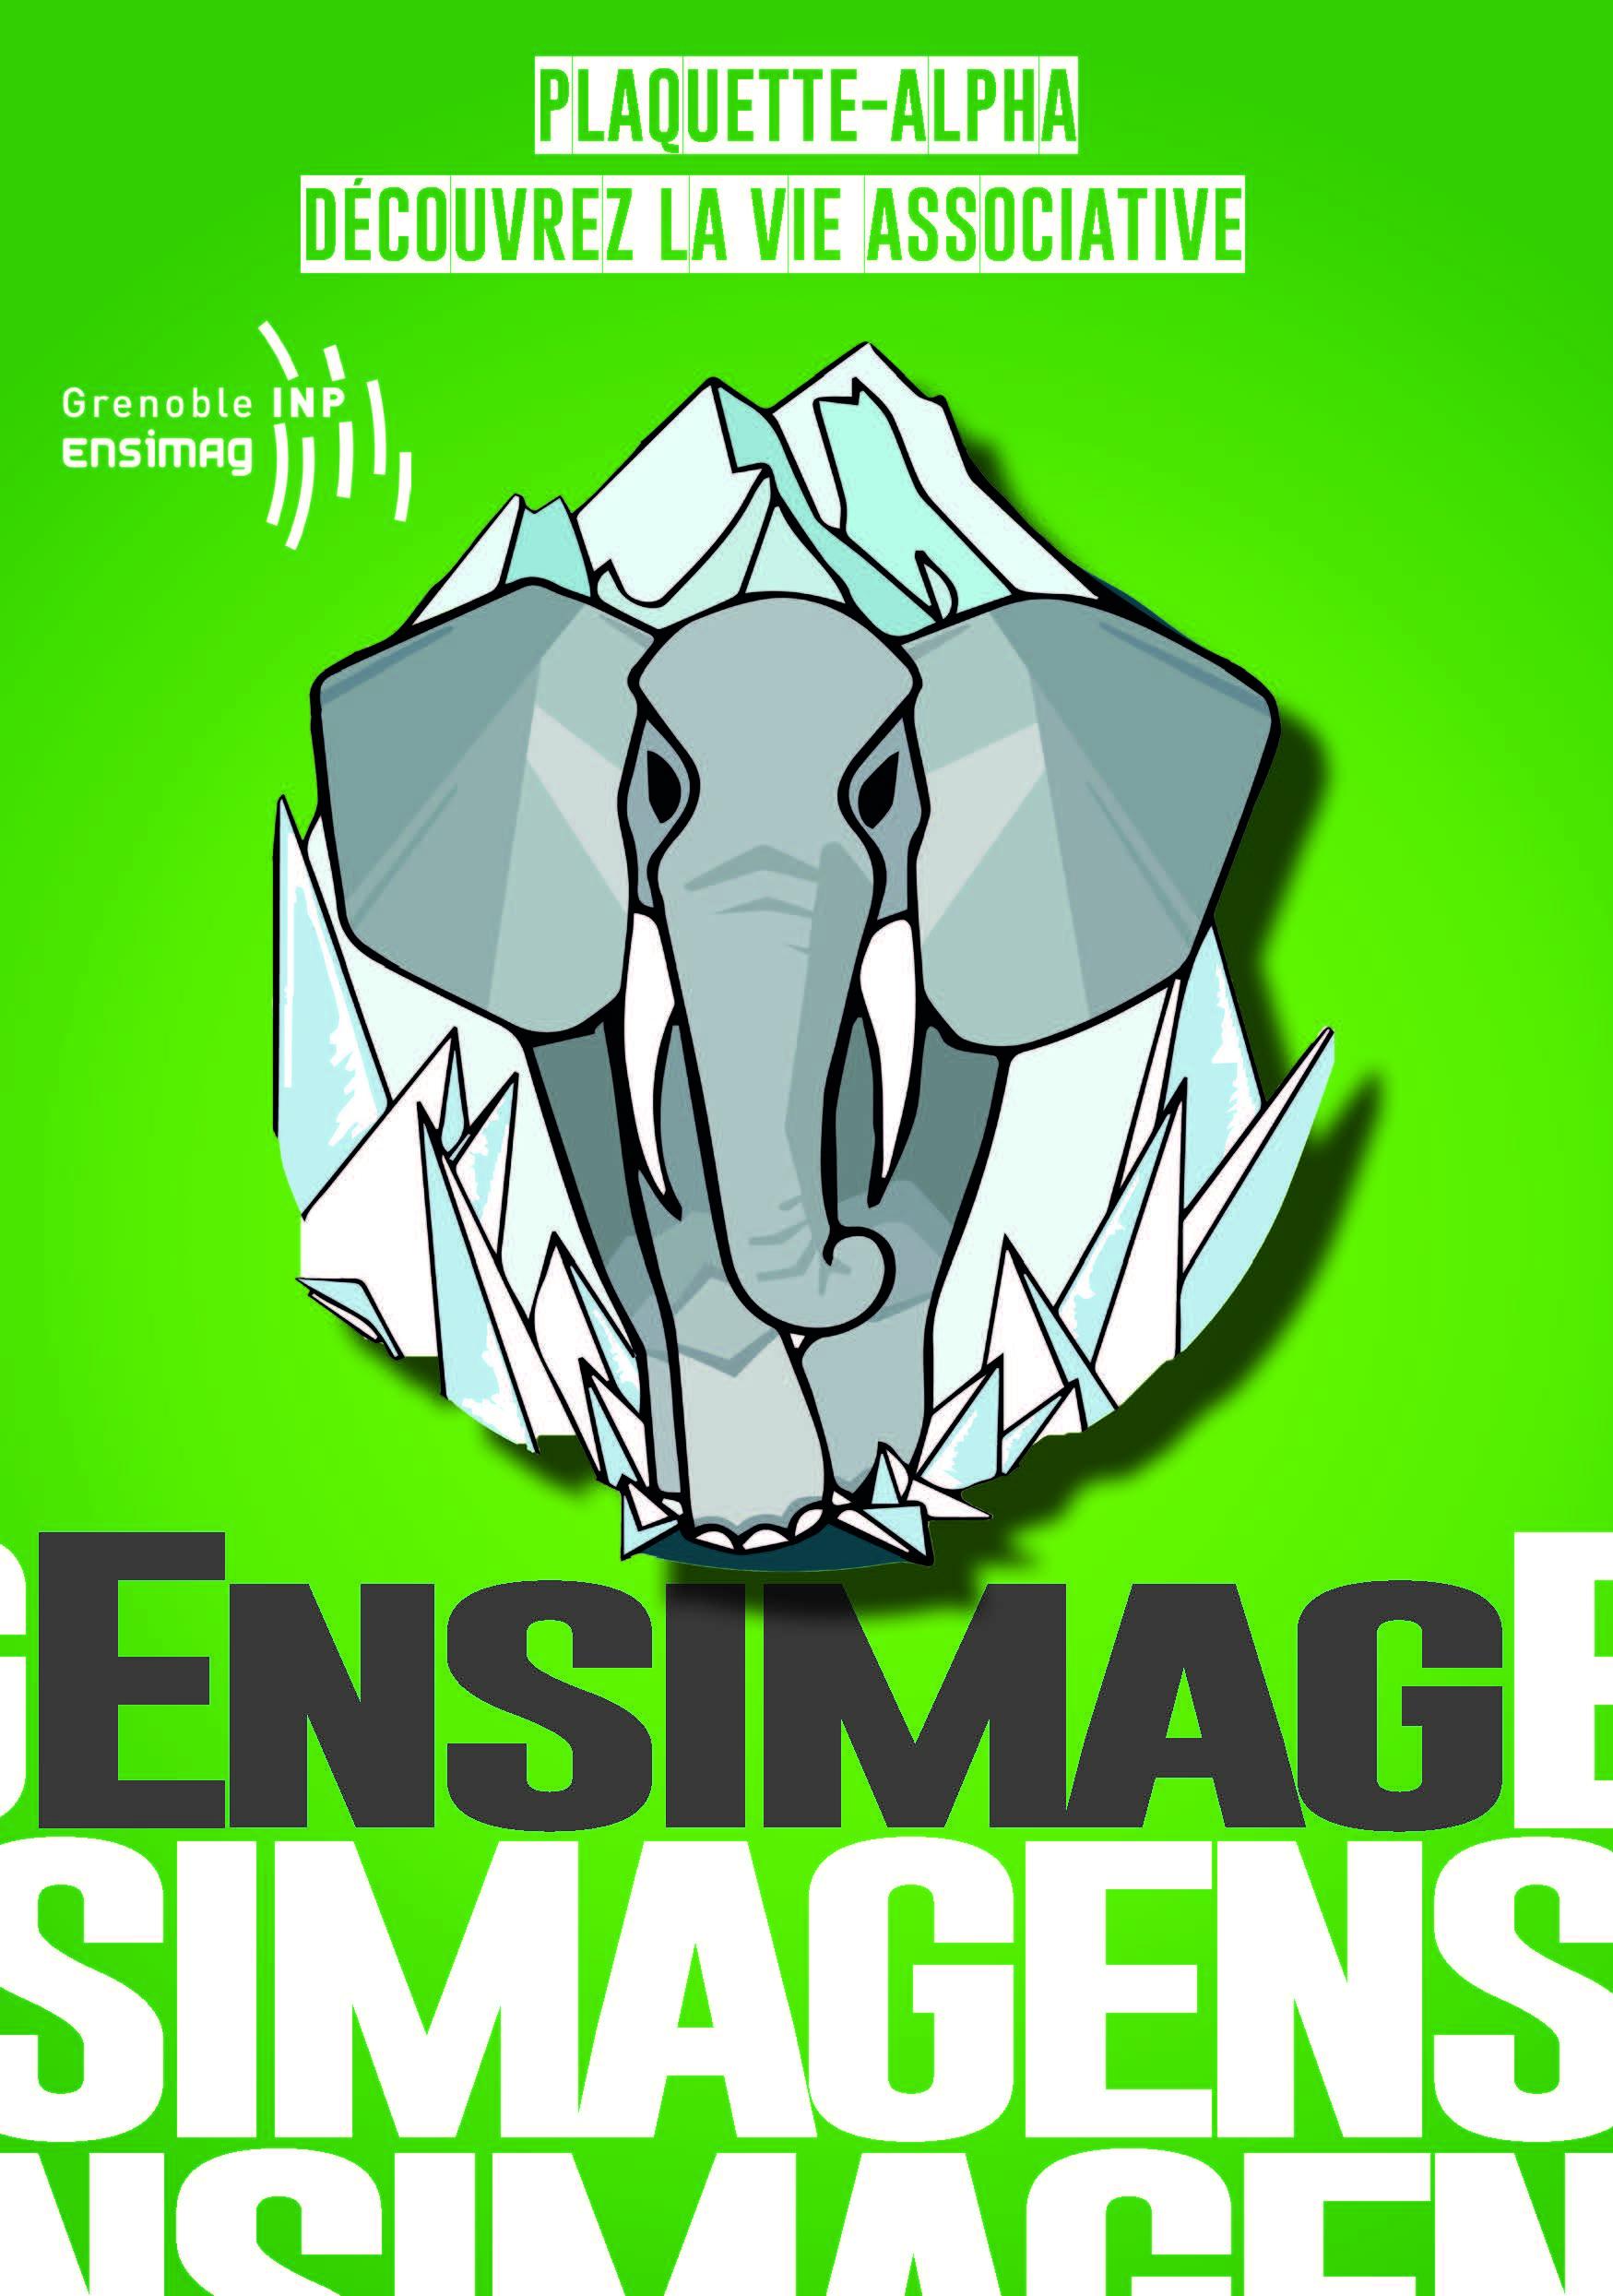 Ensimag-plaquette-alpha-2019